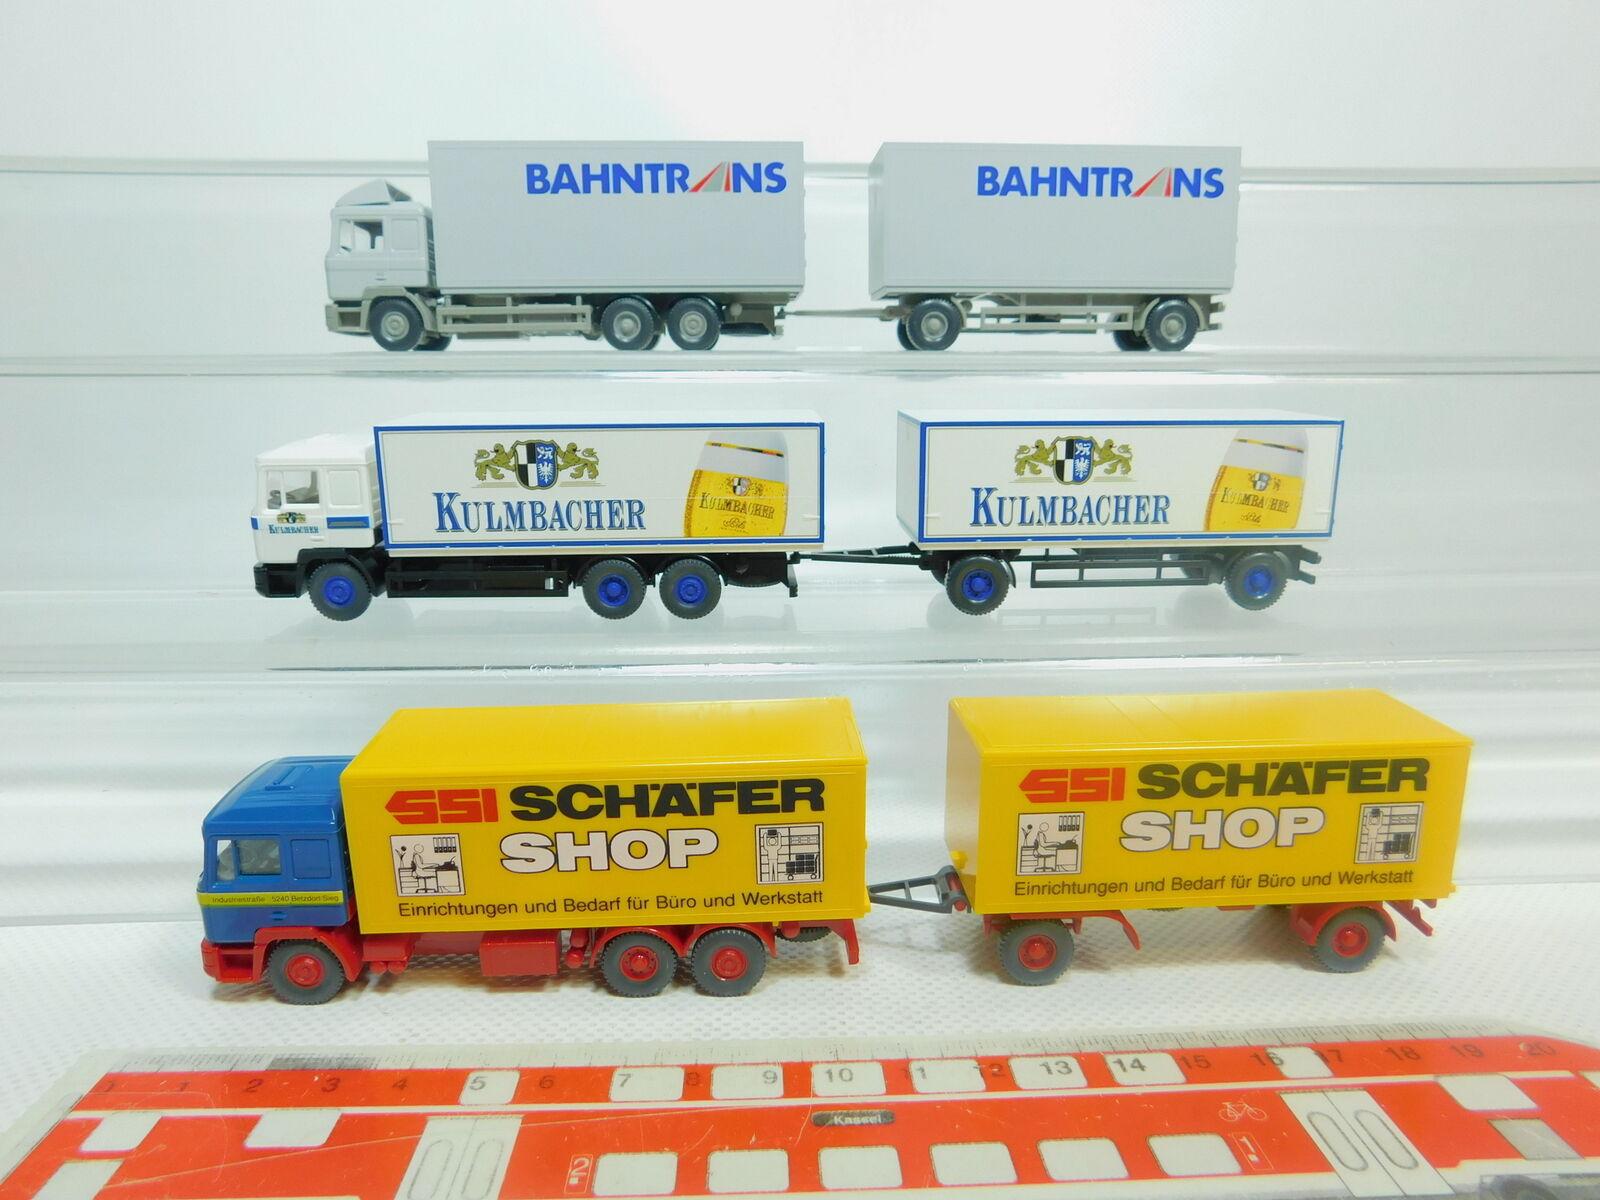 BO815-0,5x BO815-0,5x BO815-0,5x Wiking H0 1 87 Lastzug MAN  Kulmbacher+SSI Schäfer+Bahntrans, s.g. 283e6c